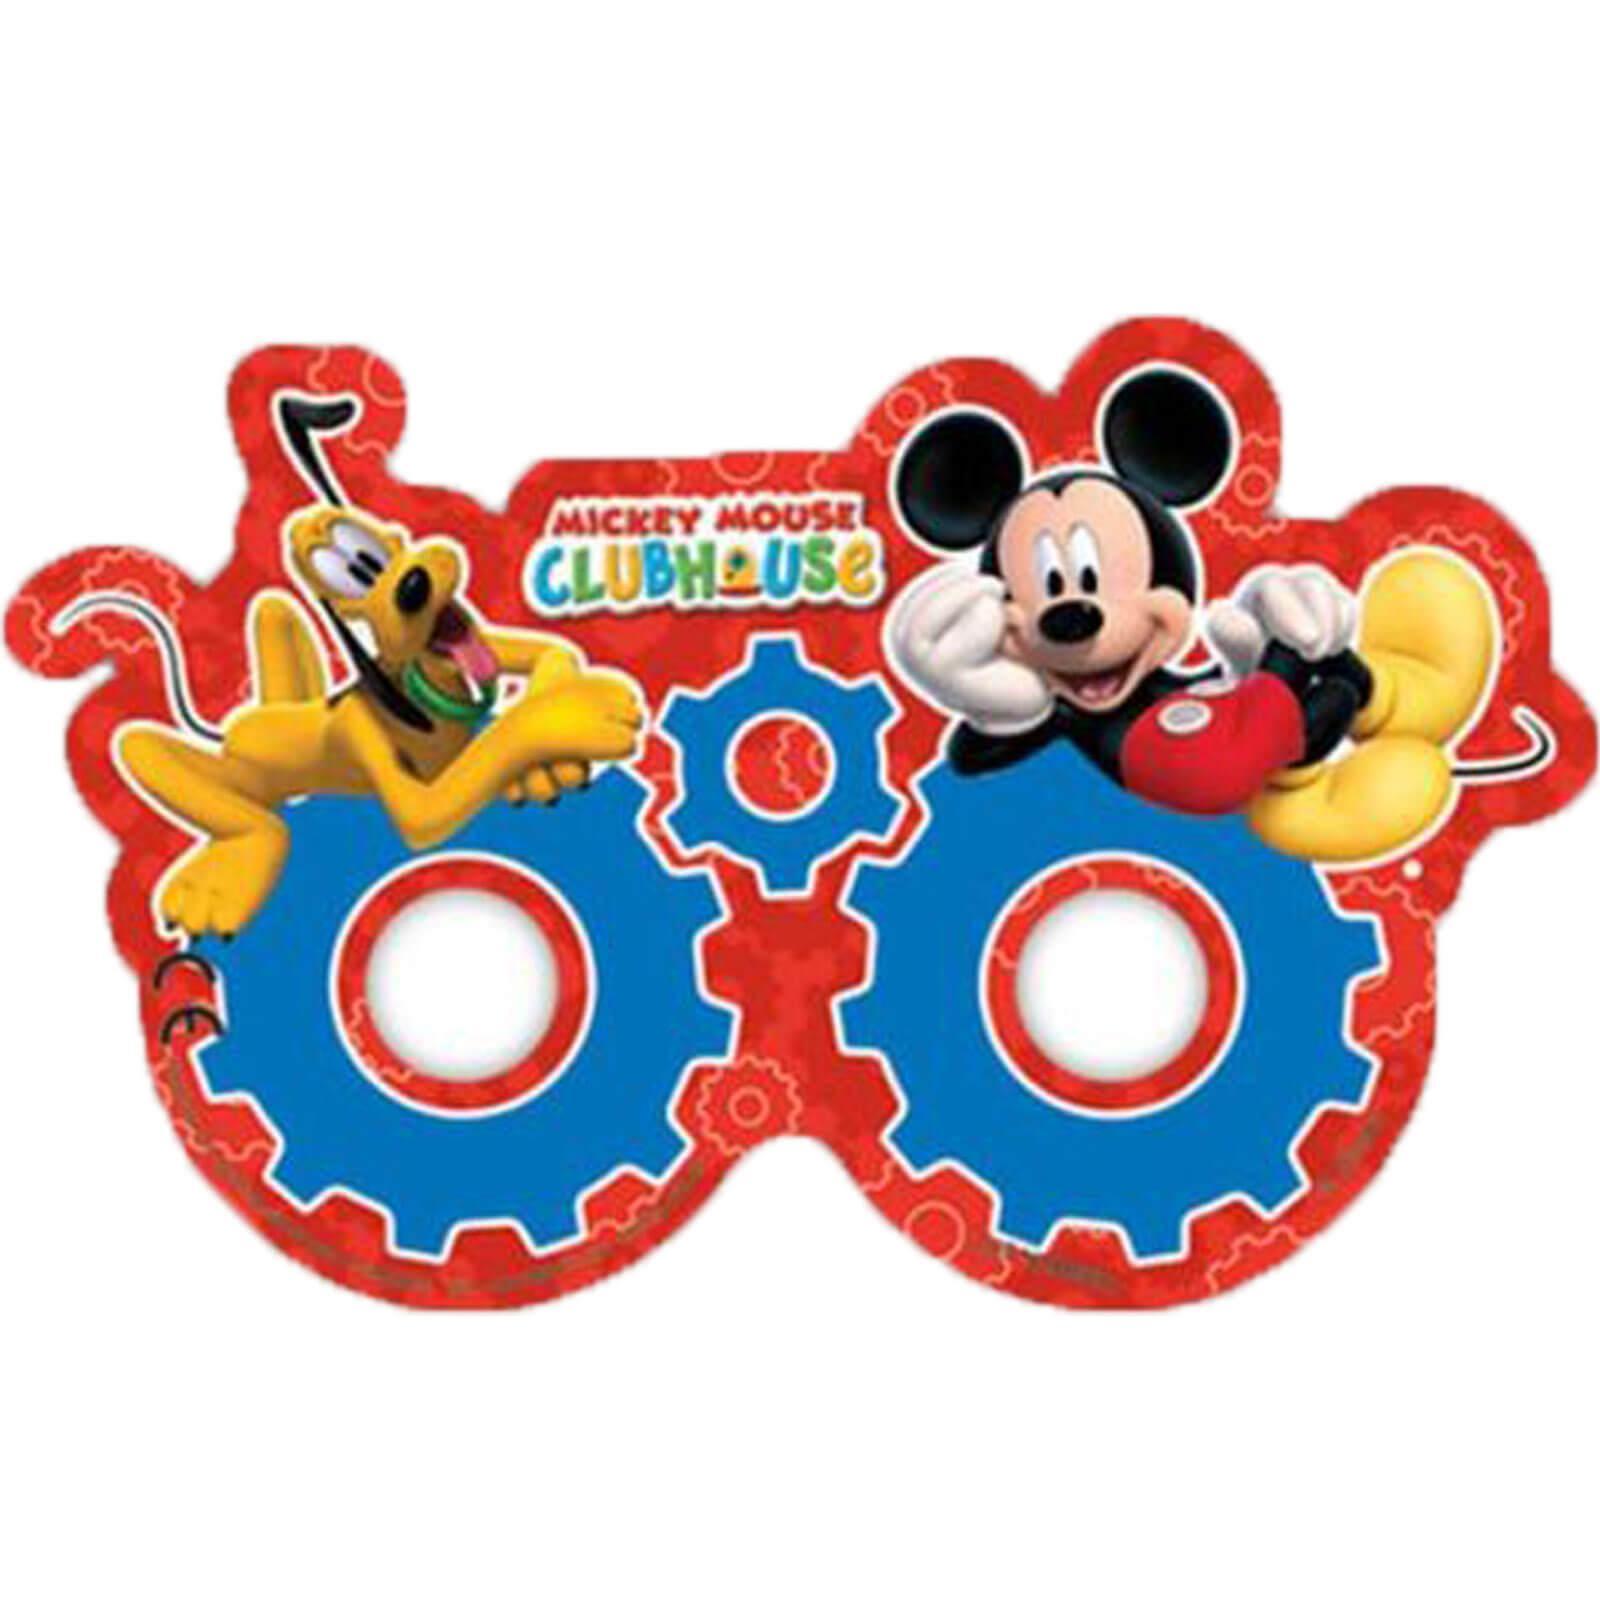 masken mickey mouse - 6er-pack - partydeko & partyartikel